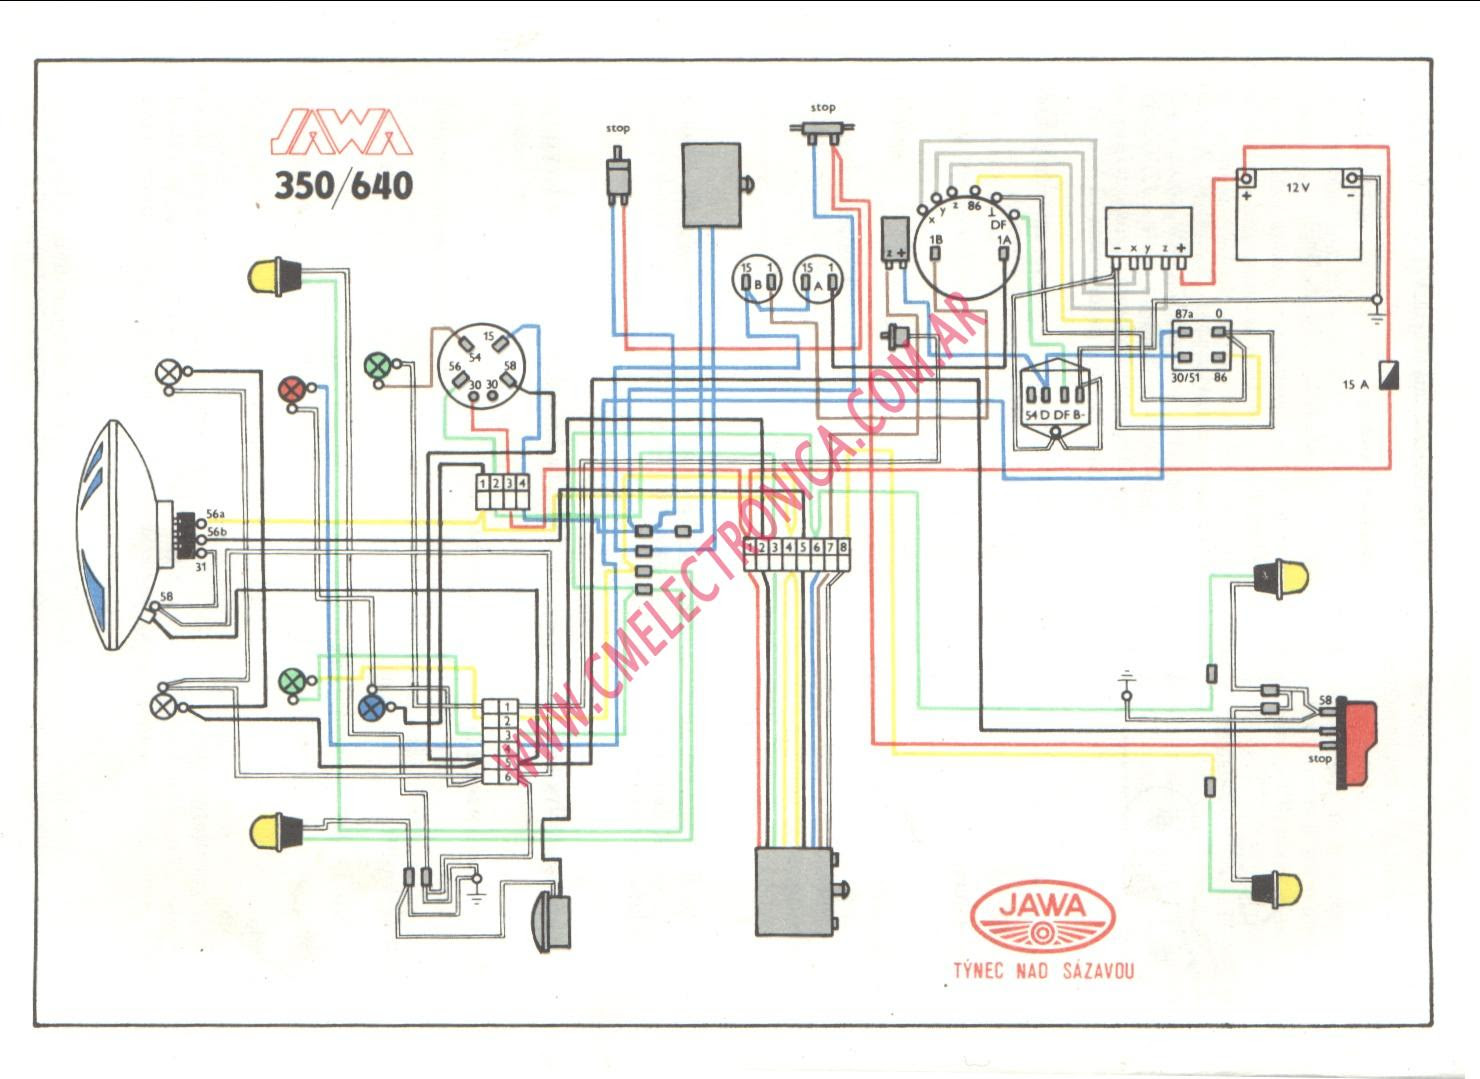 Diagram 1996 Seadoo Sportster Wiring Diagram Full Version Hd Quality At Gigabitdiagram Nrs Soluzioniacustiche It